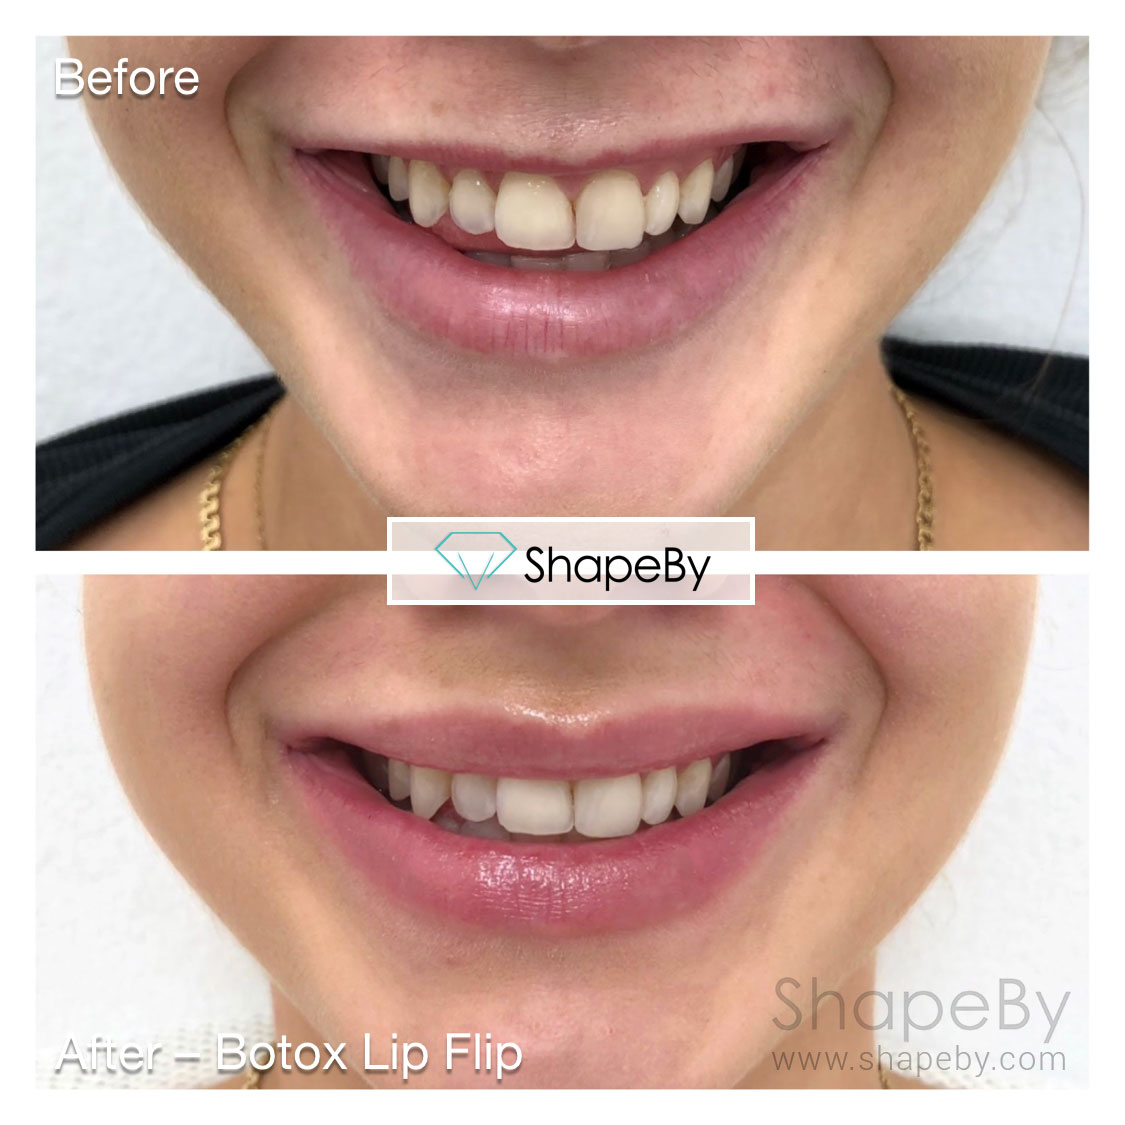 Botox Lip Flip 10.23.18